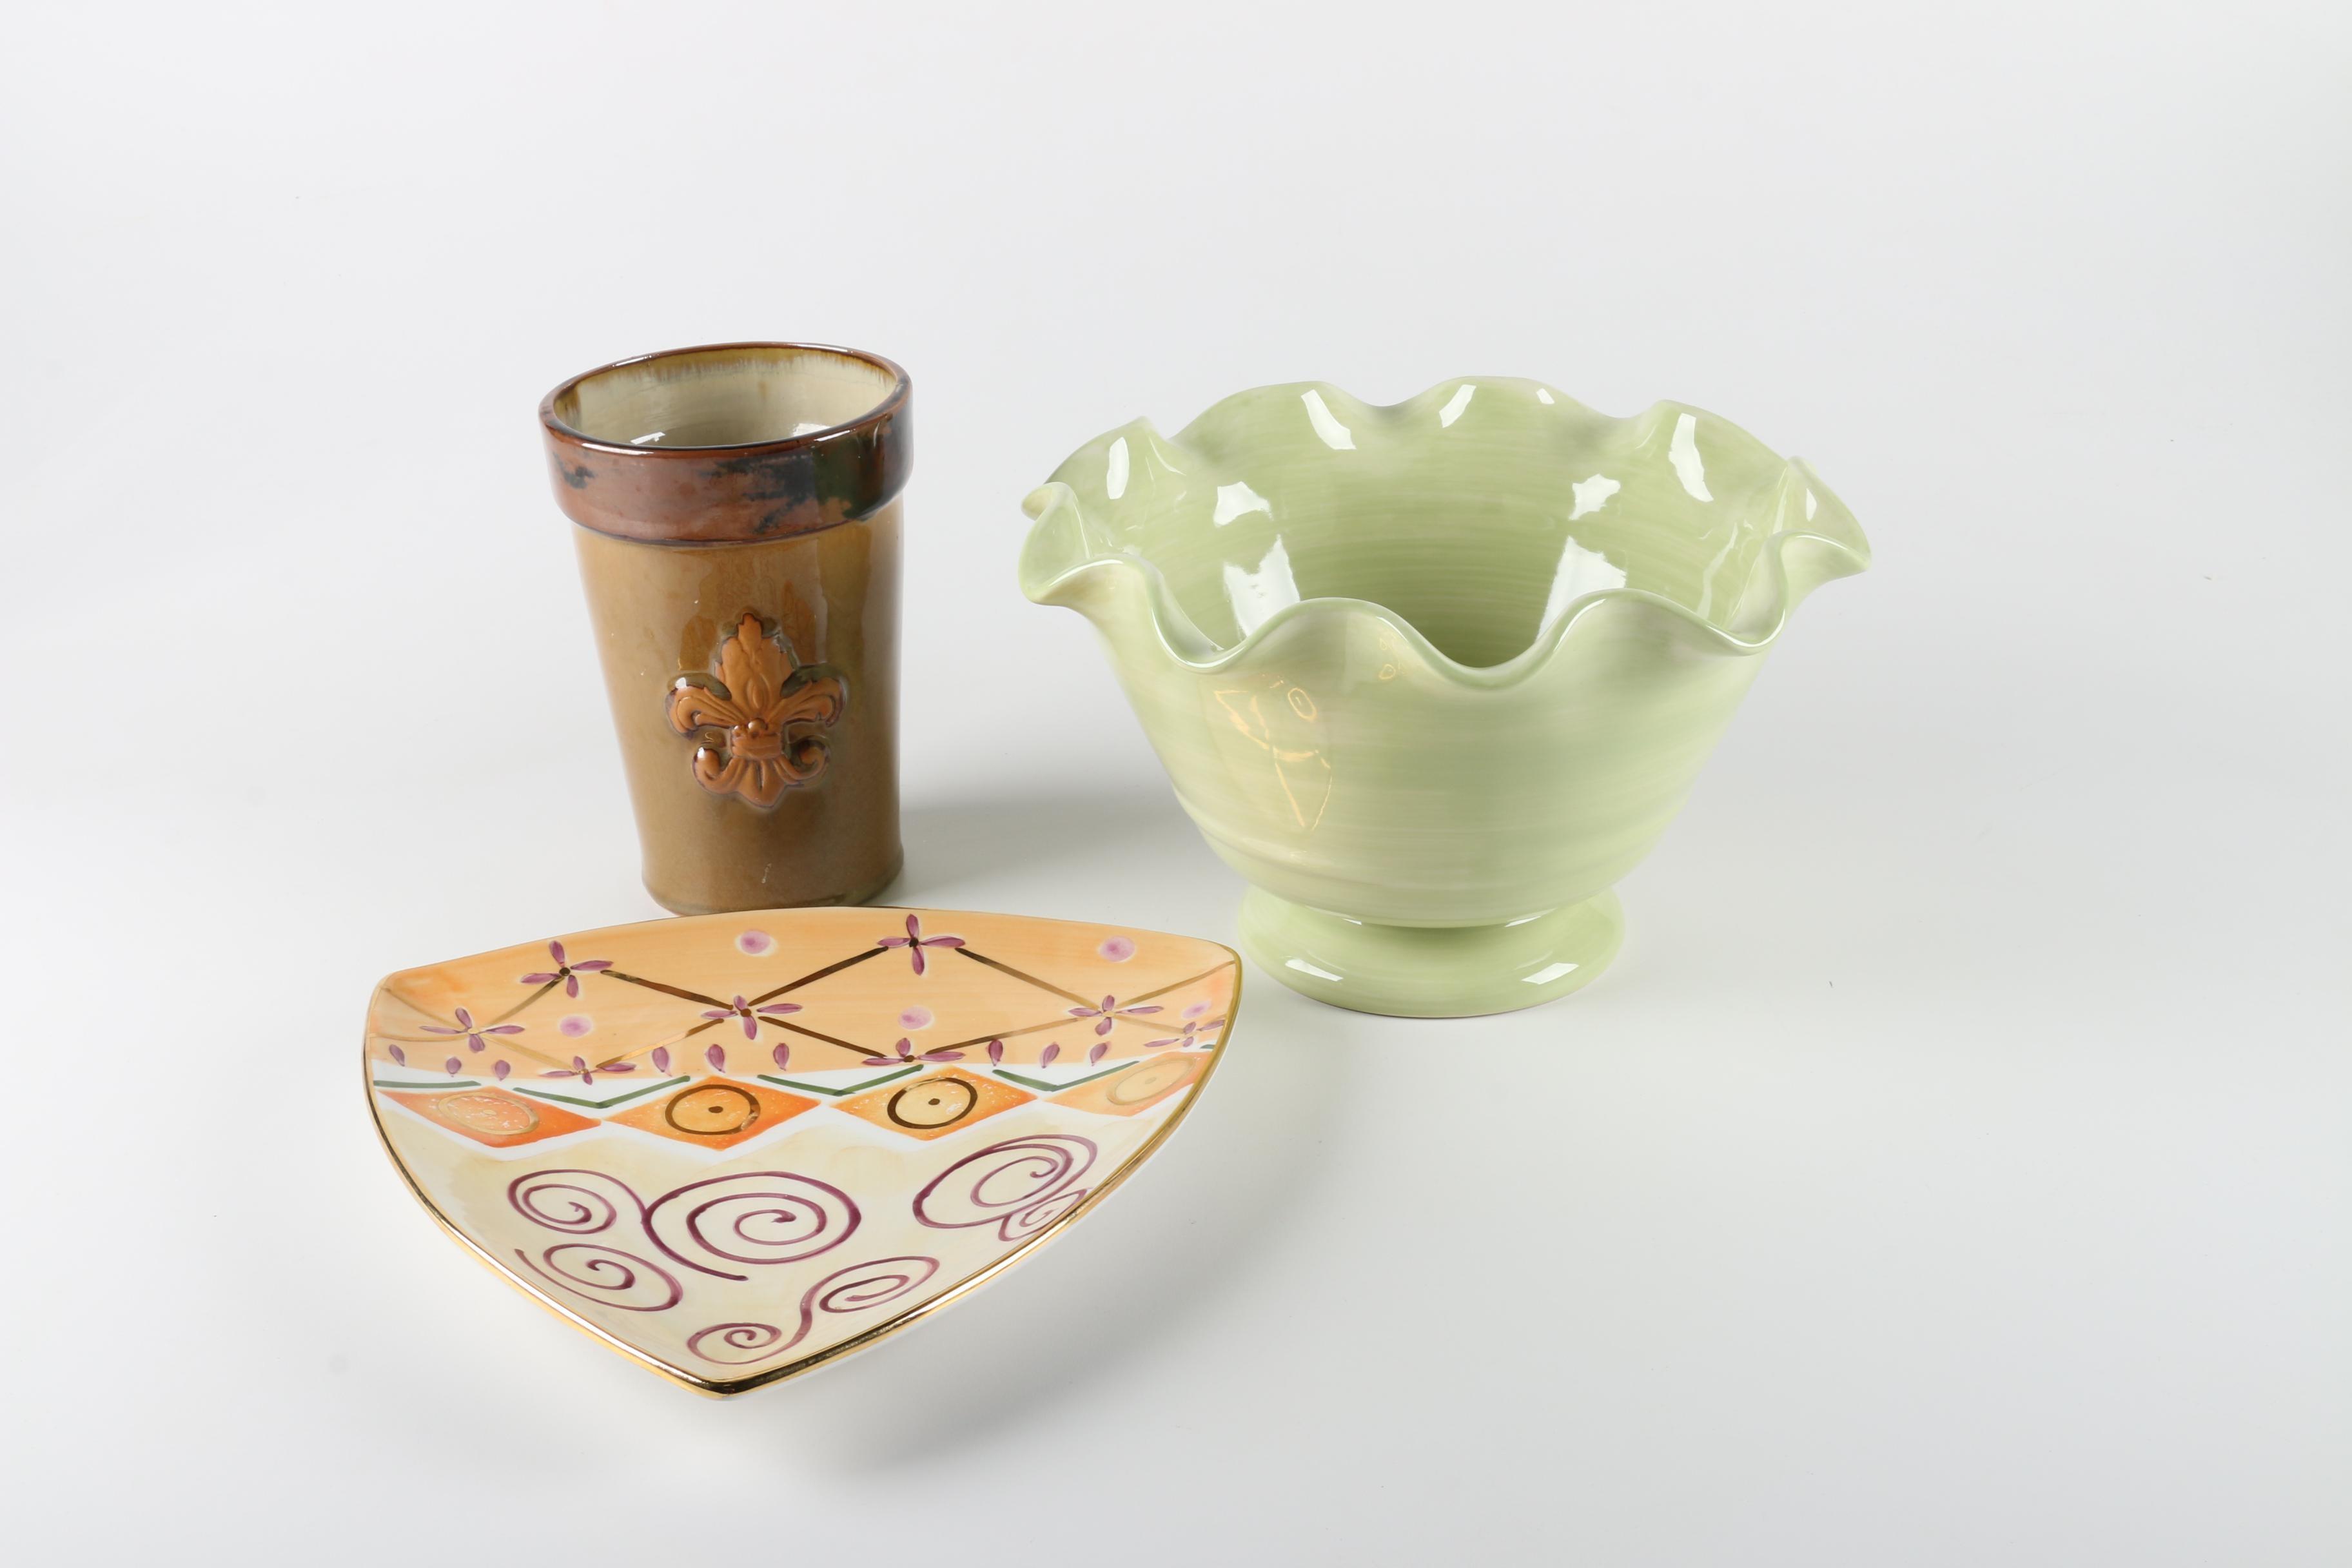 Crate&Barrel Ceramic Bowl with Decor